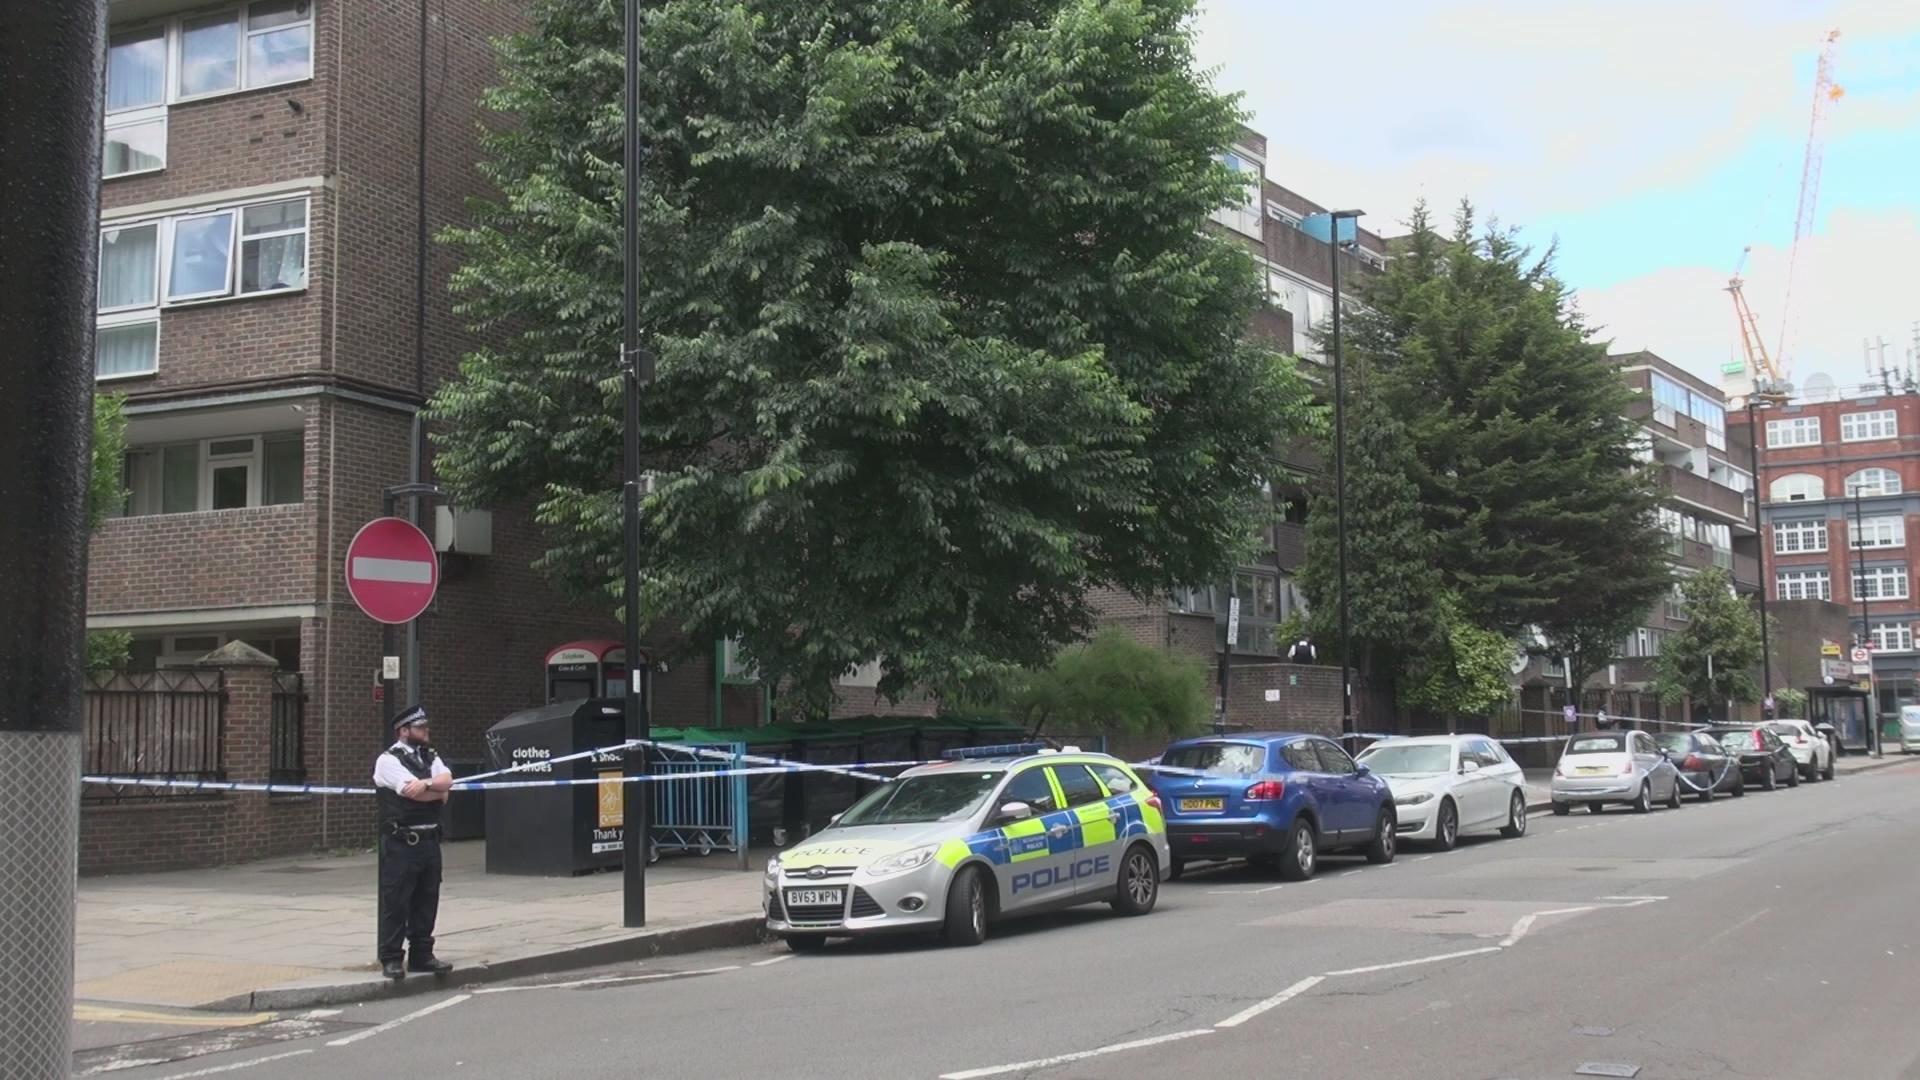 Man Found With Gunshot Injuries In North London